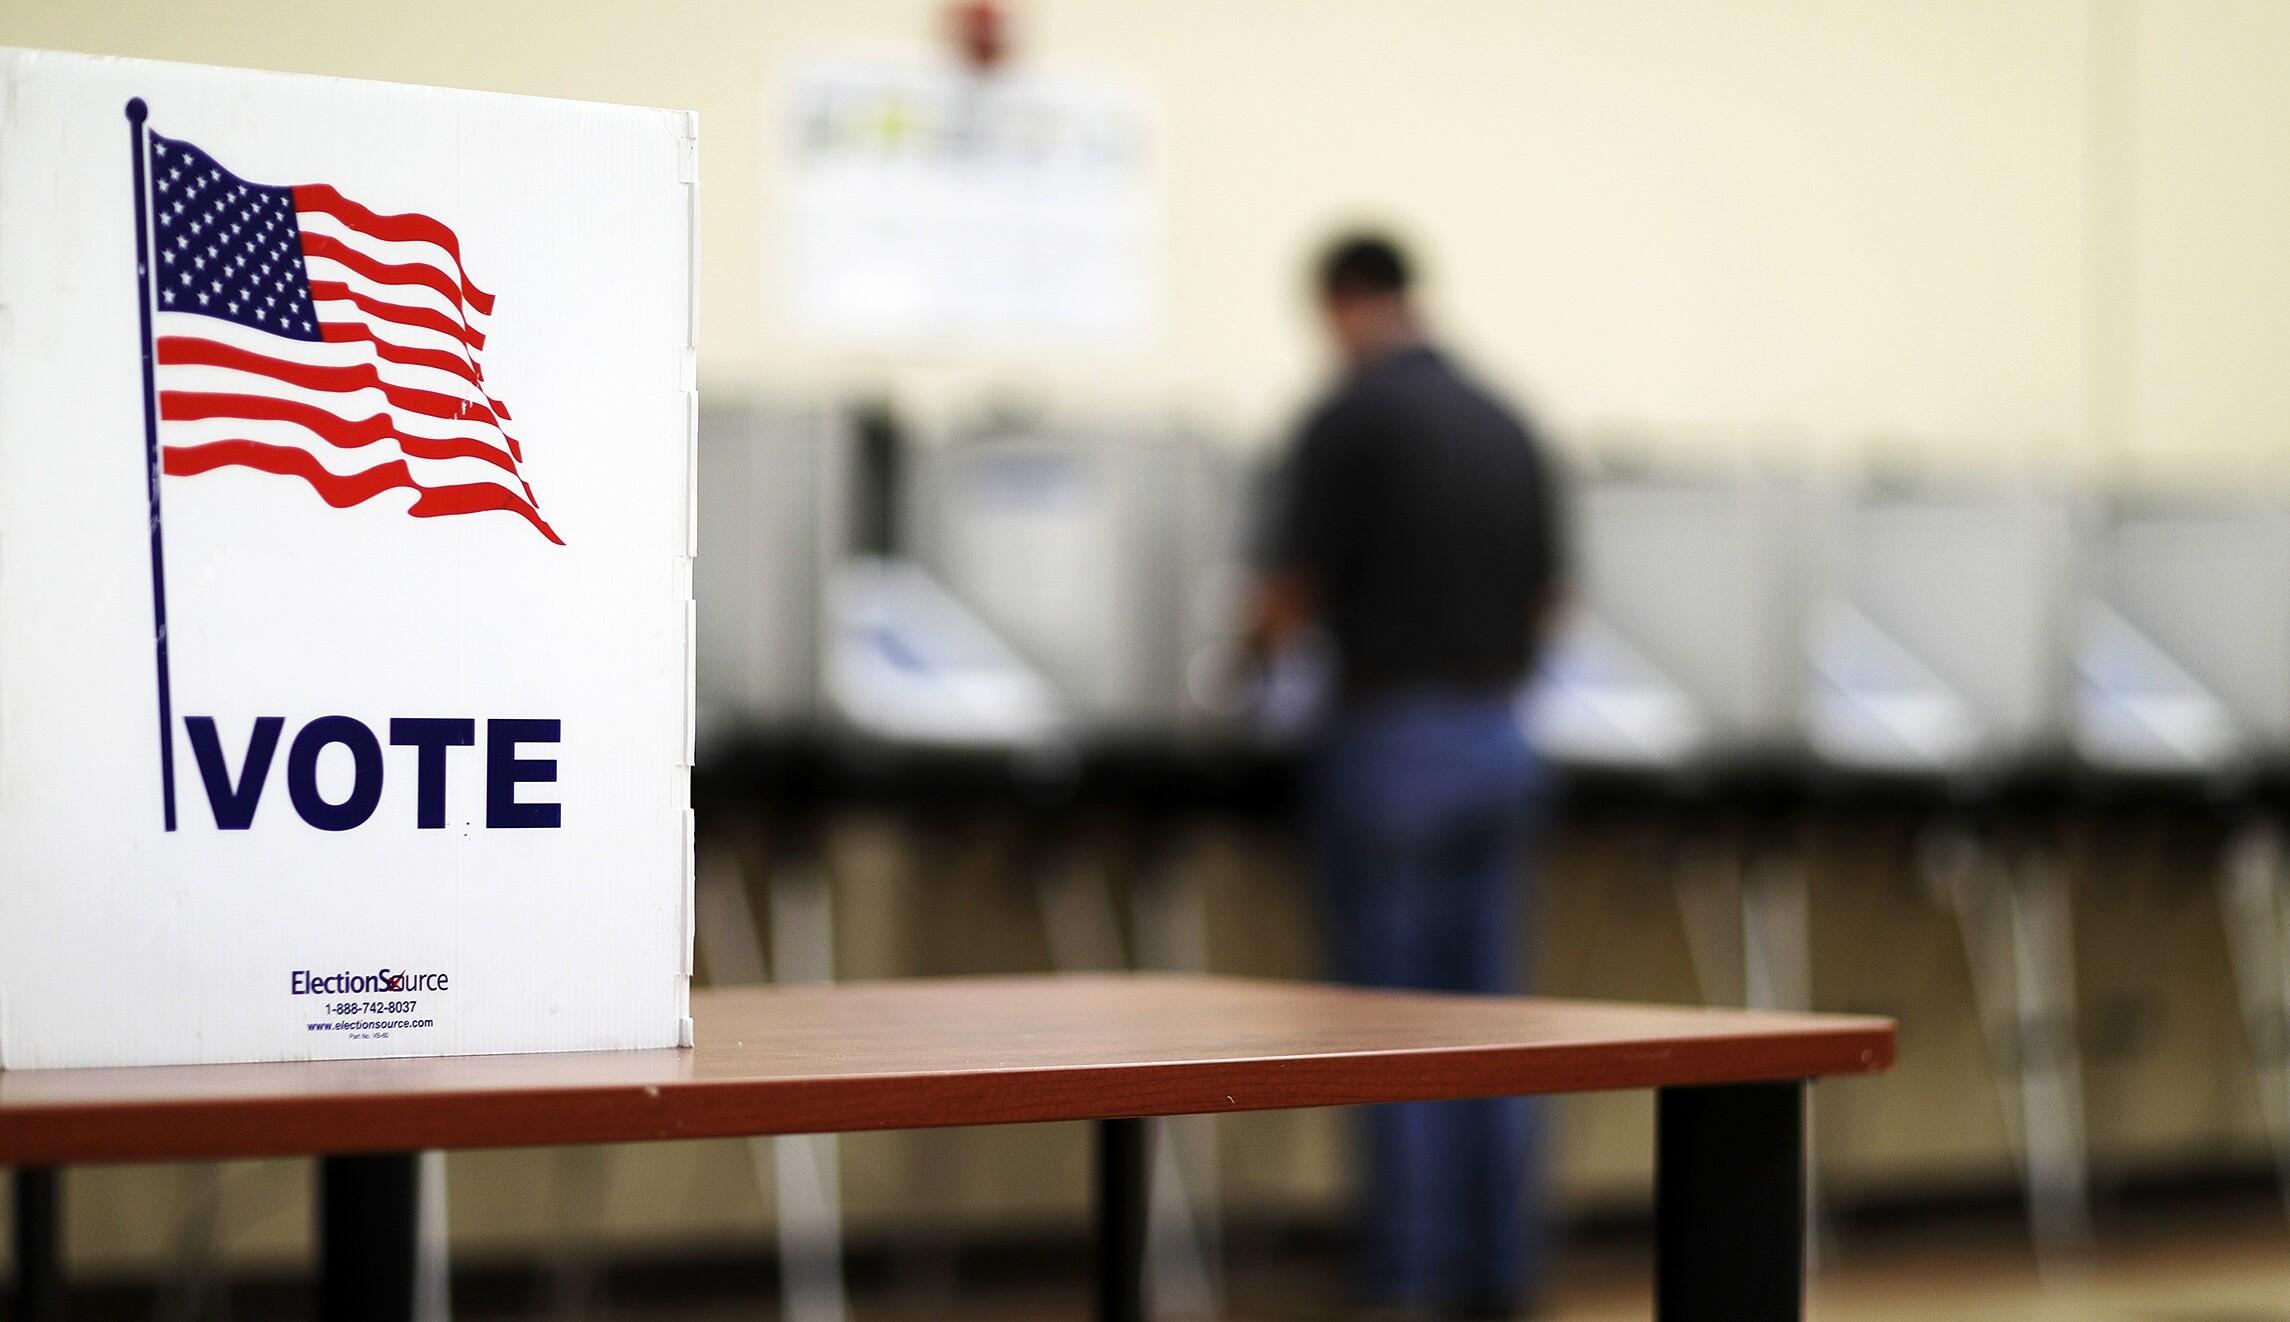 070417 georgia voters Gazette story pic